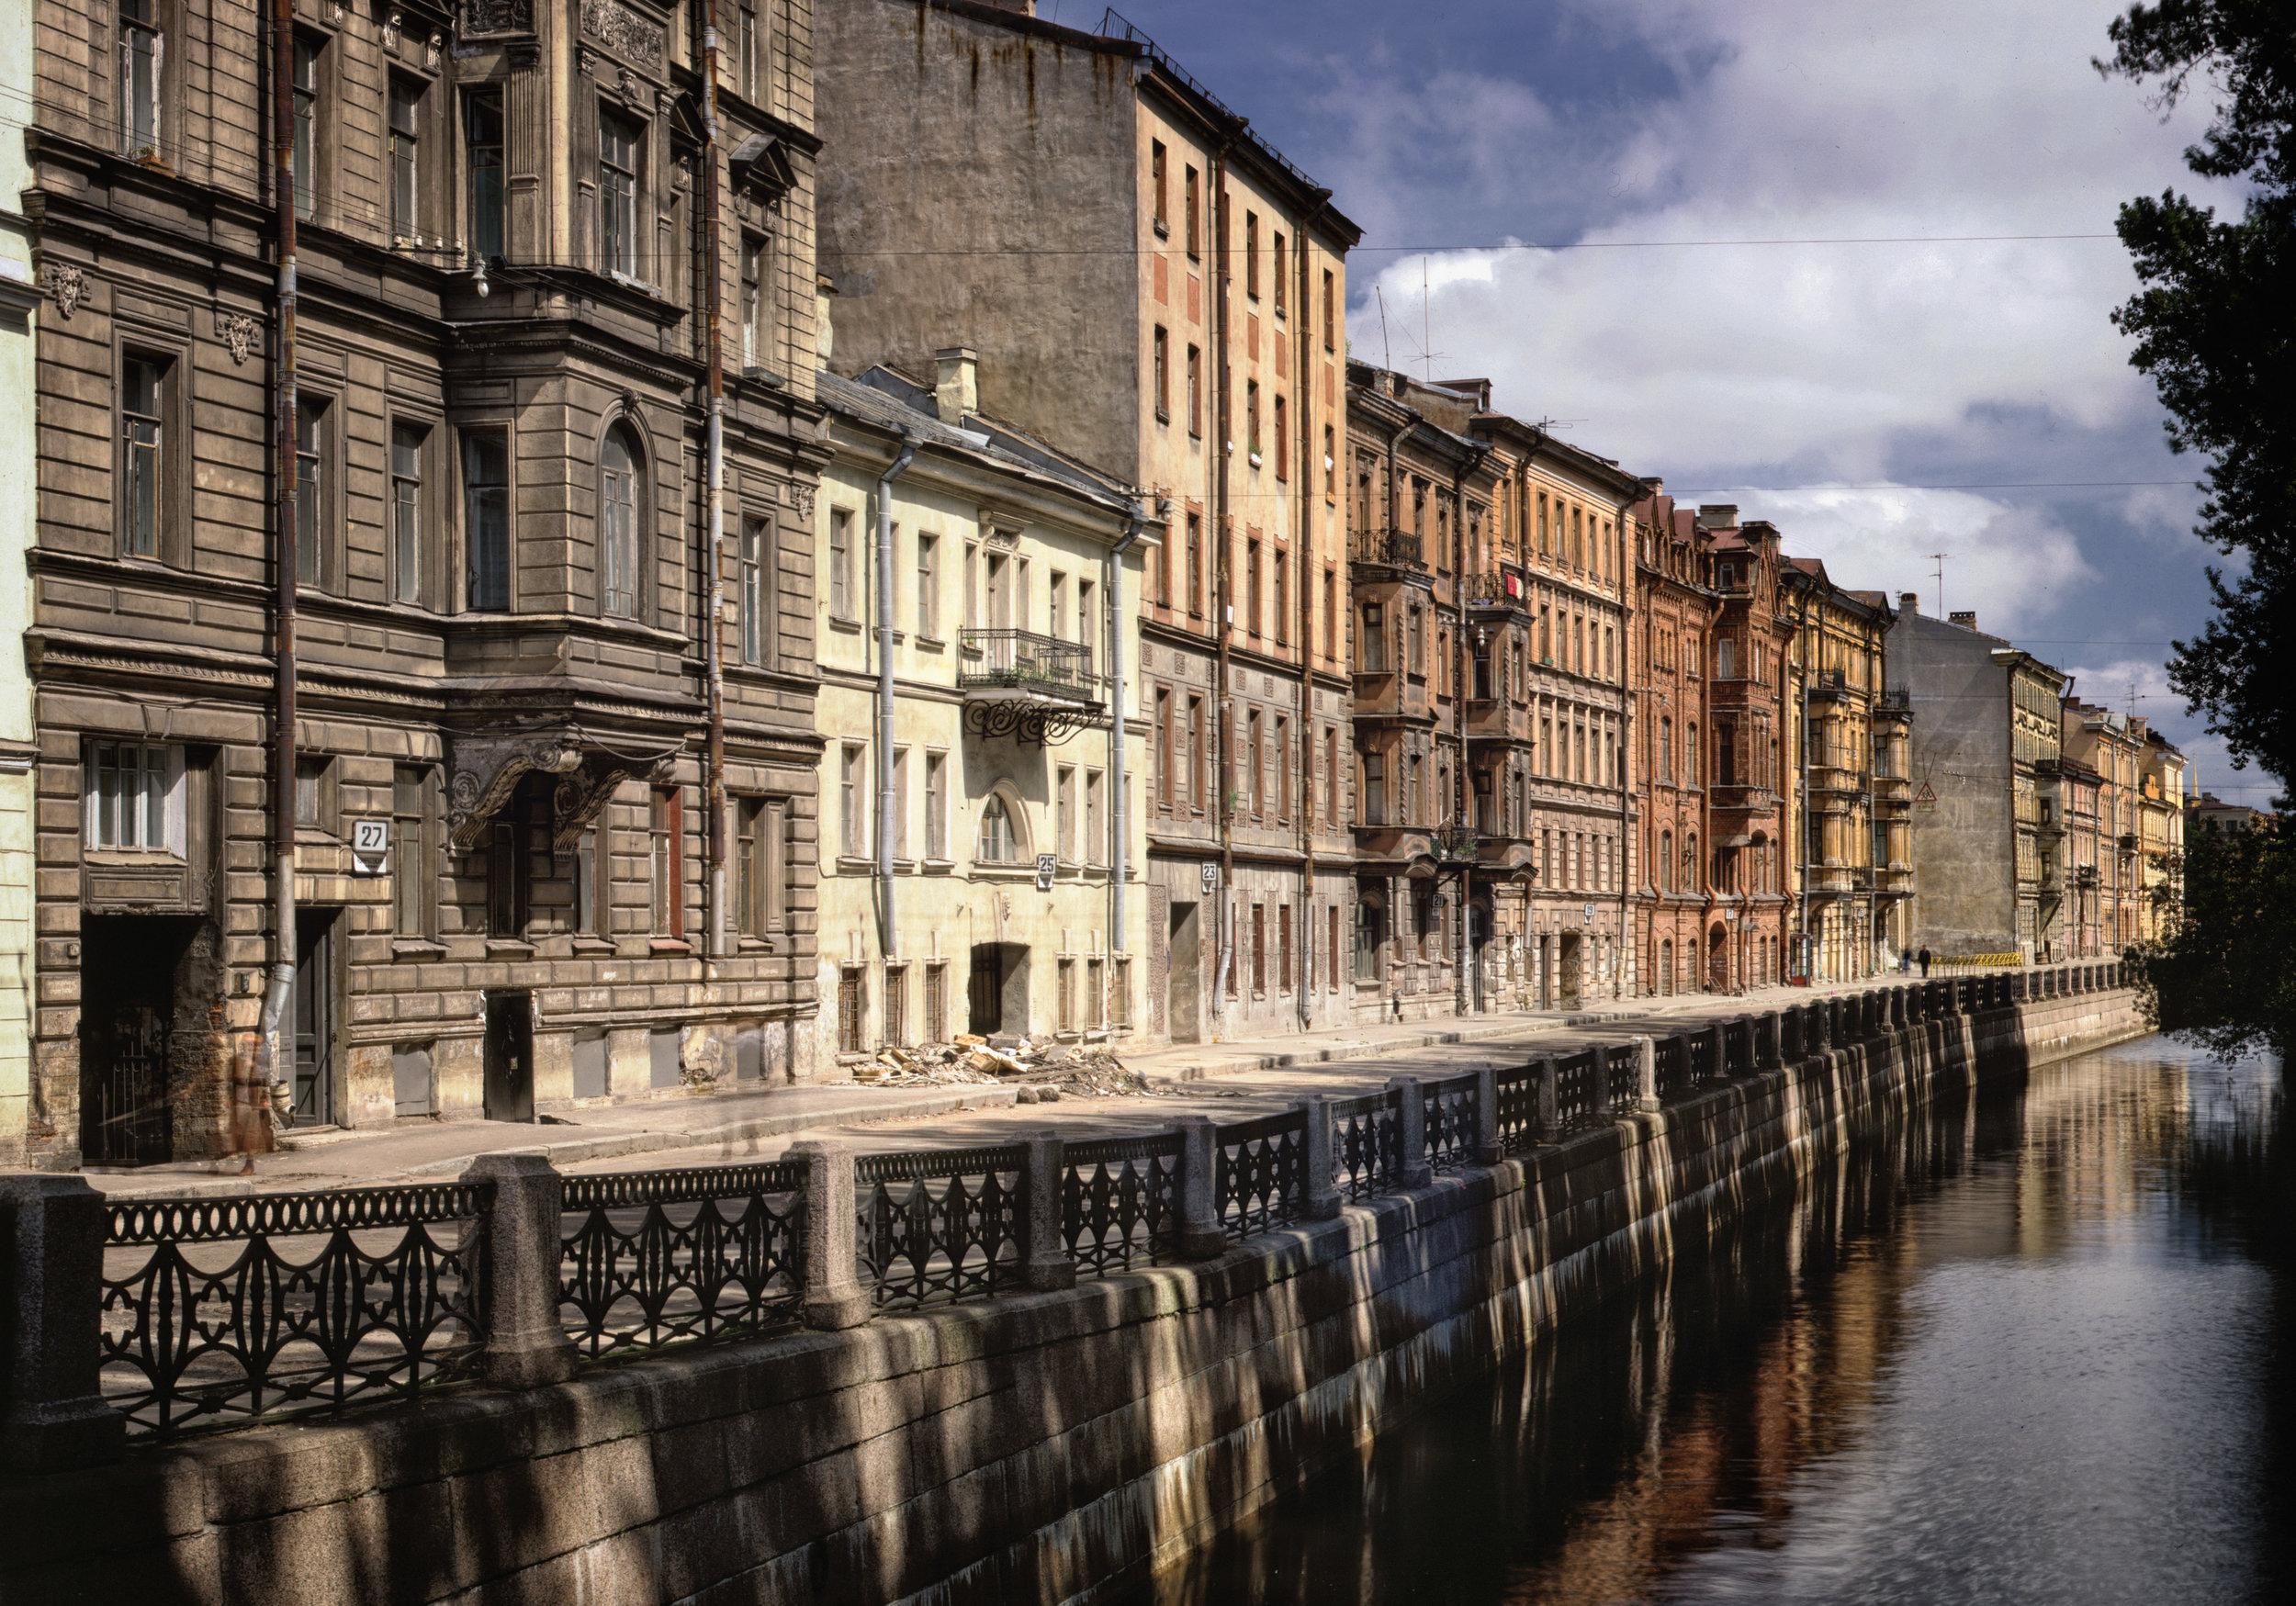 Admiralteysky (Admiralty) Canal Embankment Opposite The New Holland Island - Saint Petersburg